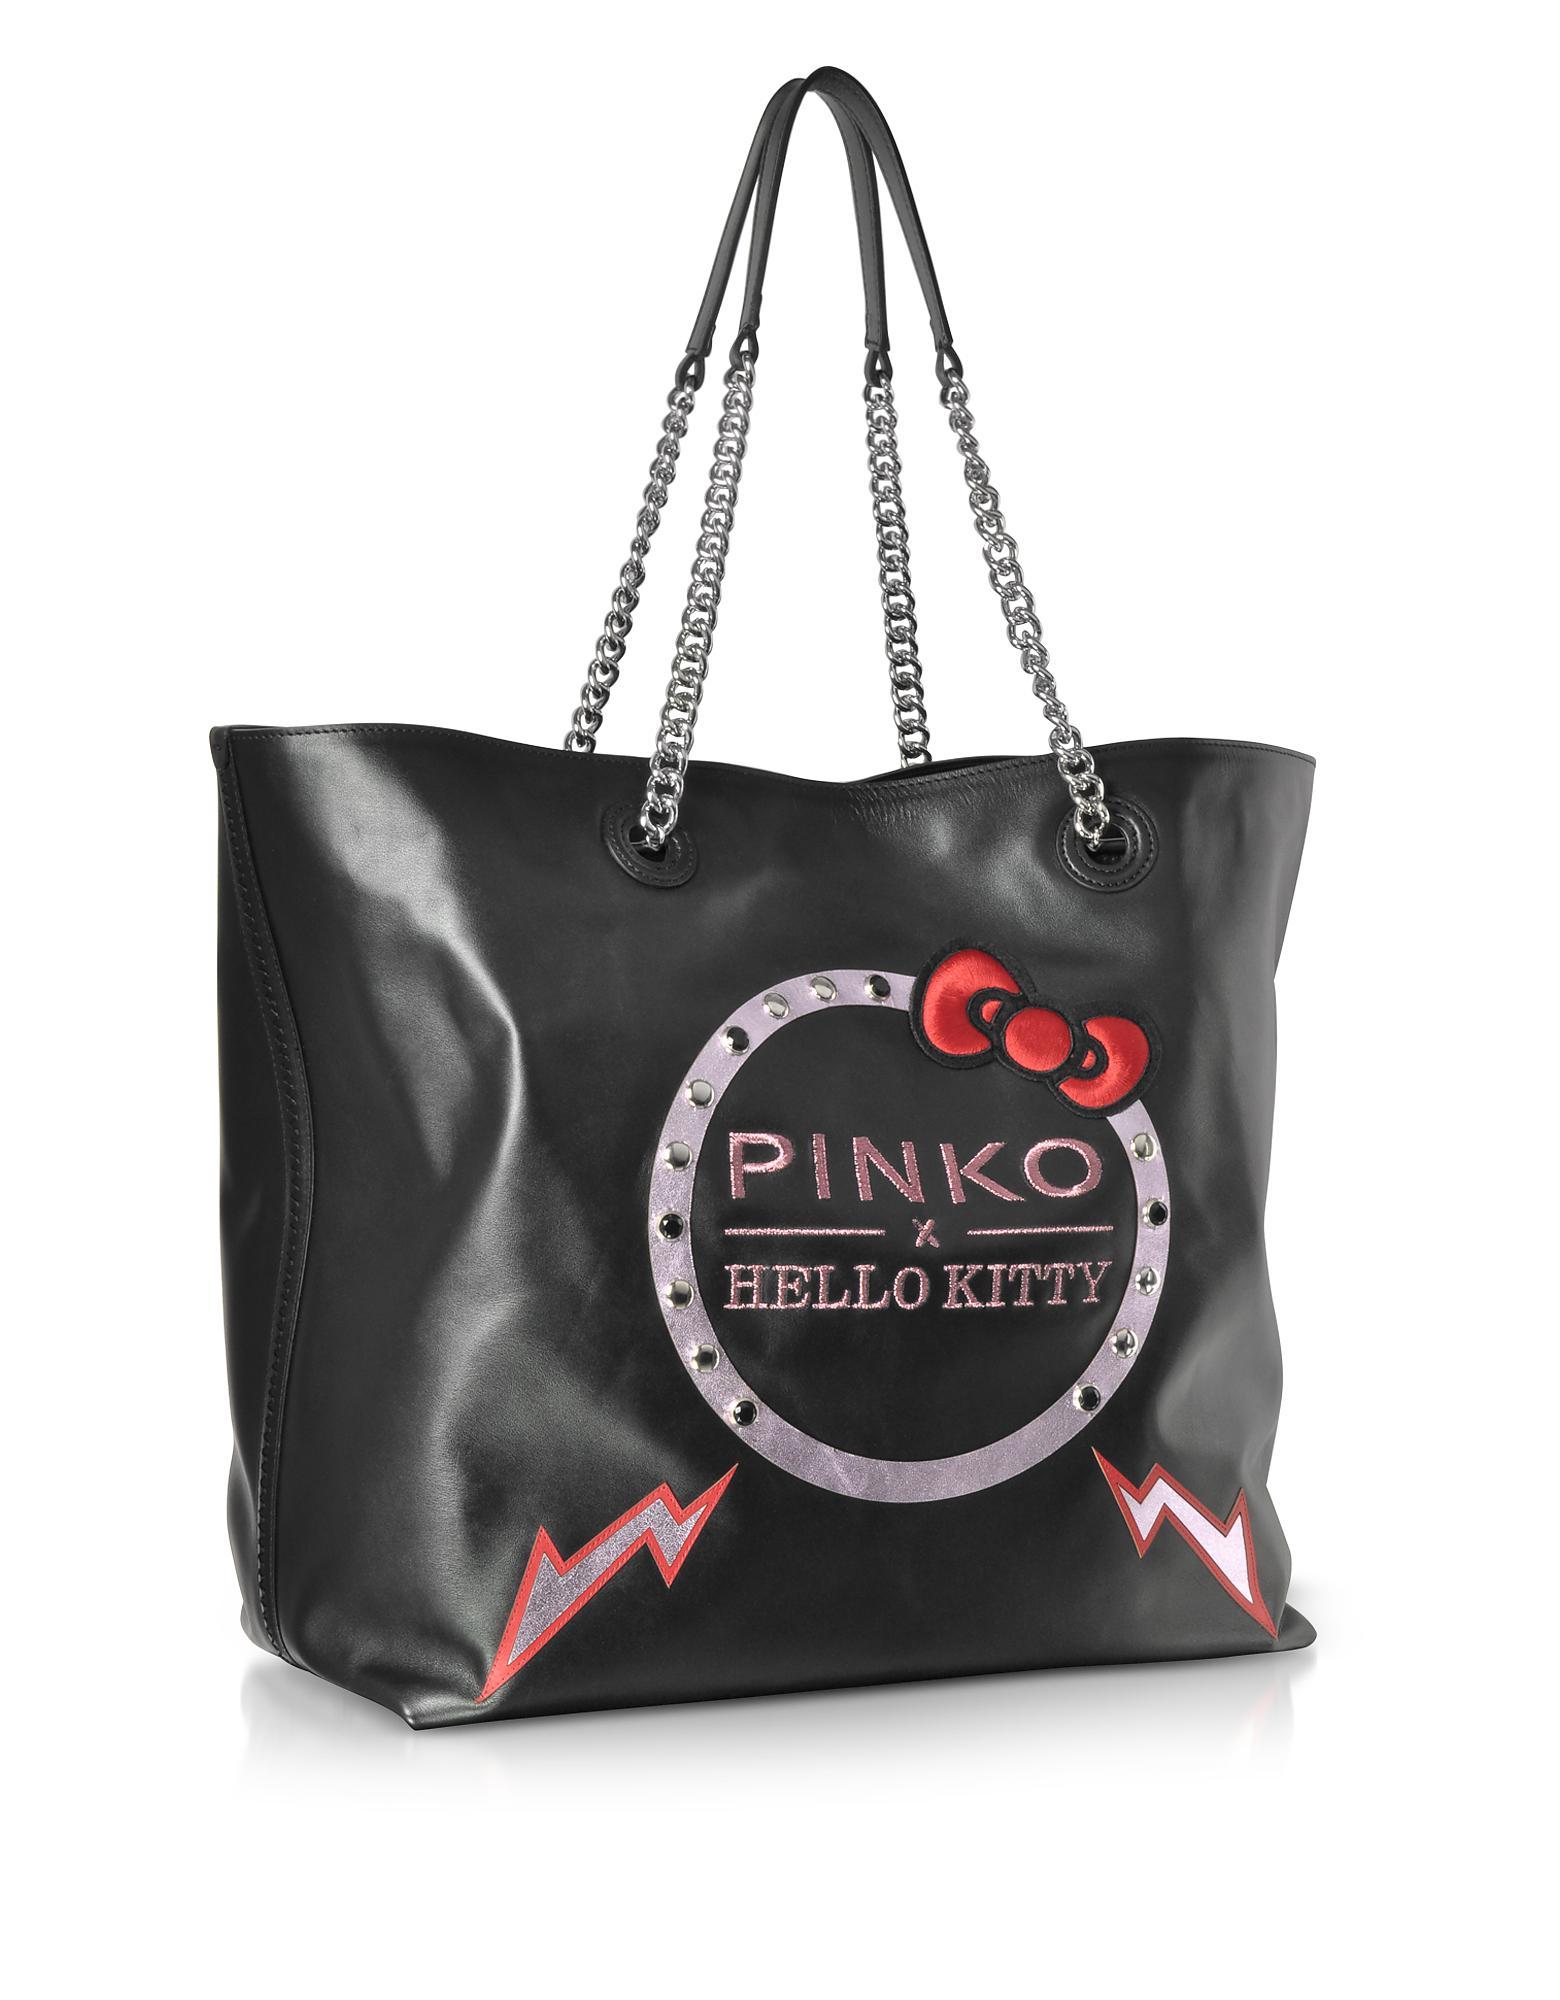 2113baa119dc Pinko Hello Kitty Ribbon Maxi Black Eco Leather Tote Bag in Black - Lyst